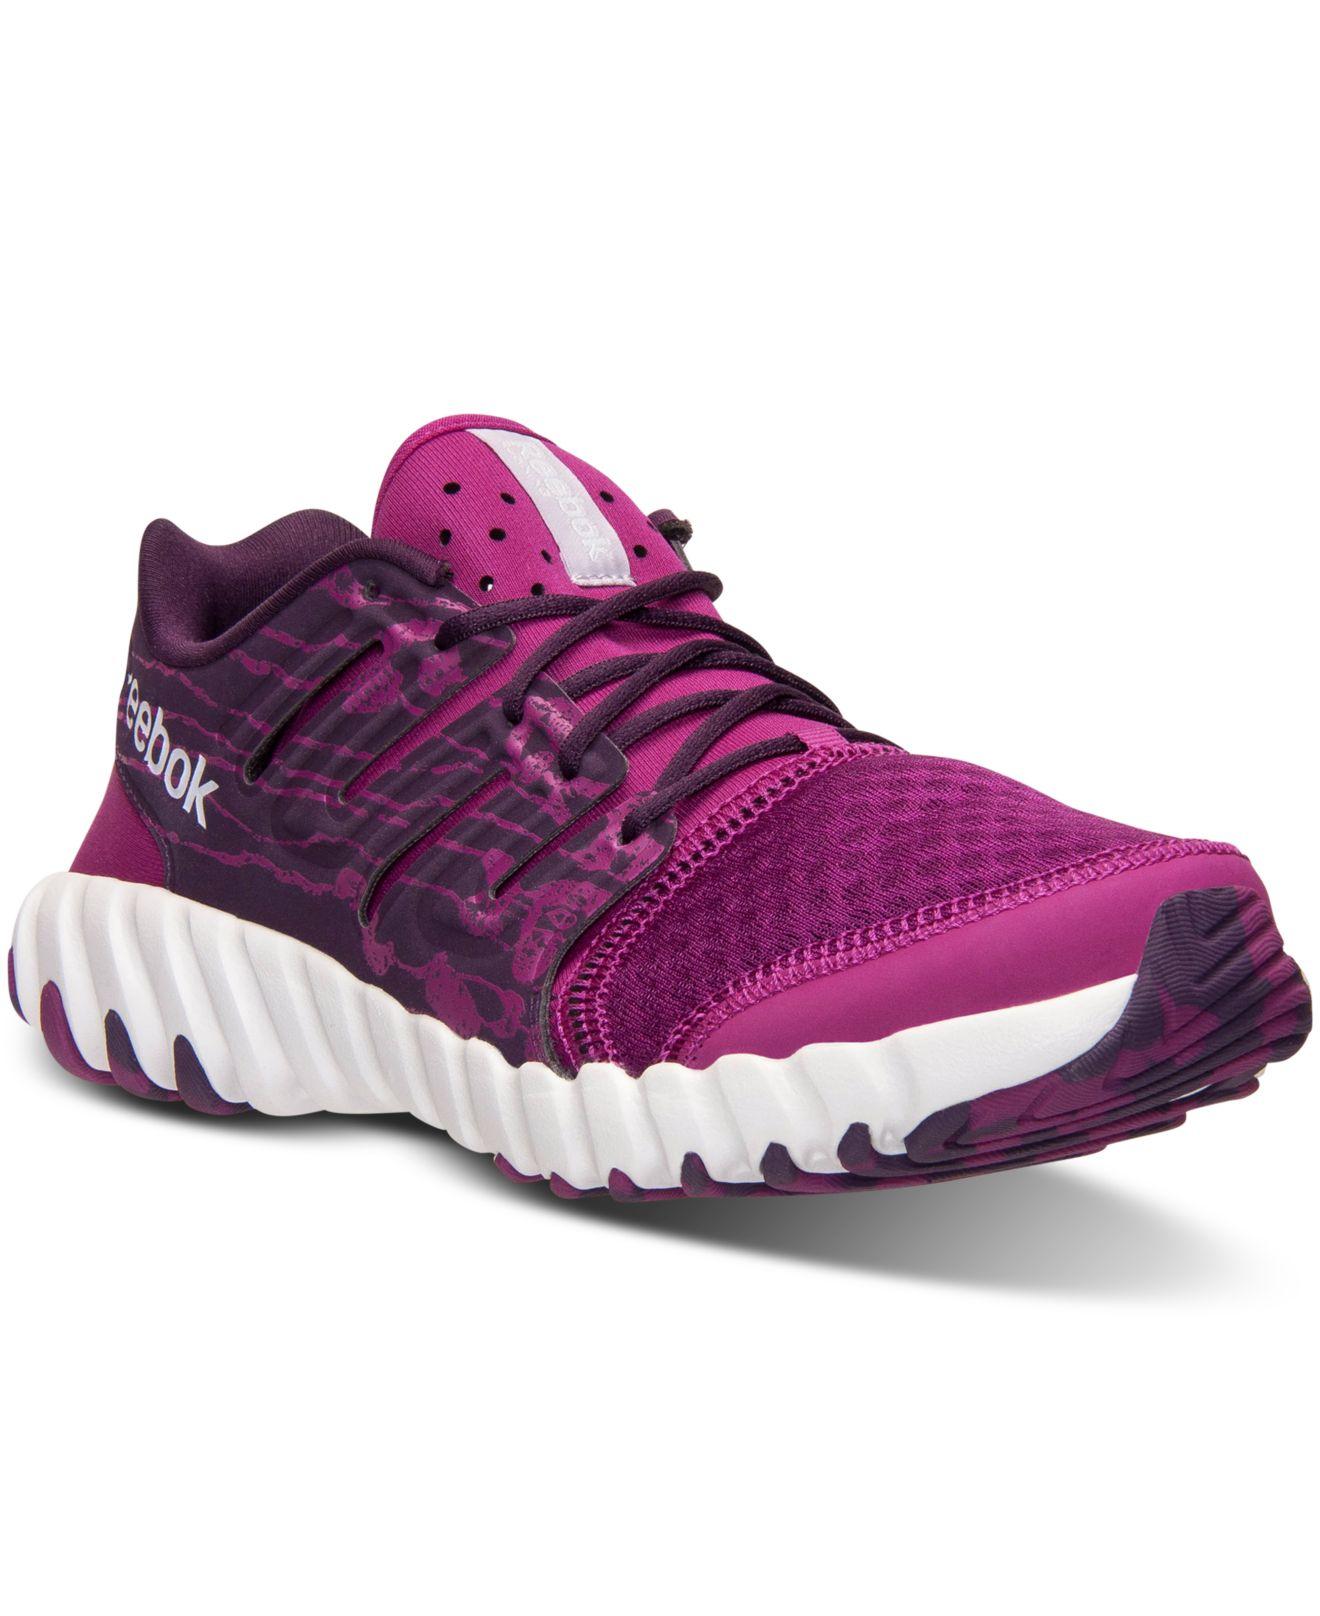 Lyst - Reebok Women s Twistform Running Sneakers From Finish Line in ... 6a5f6c50c